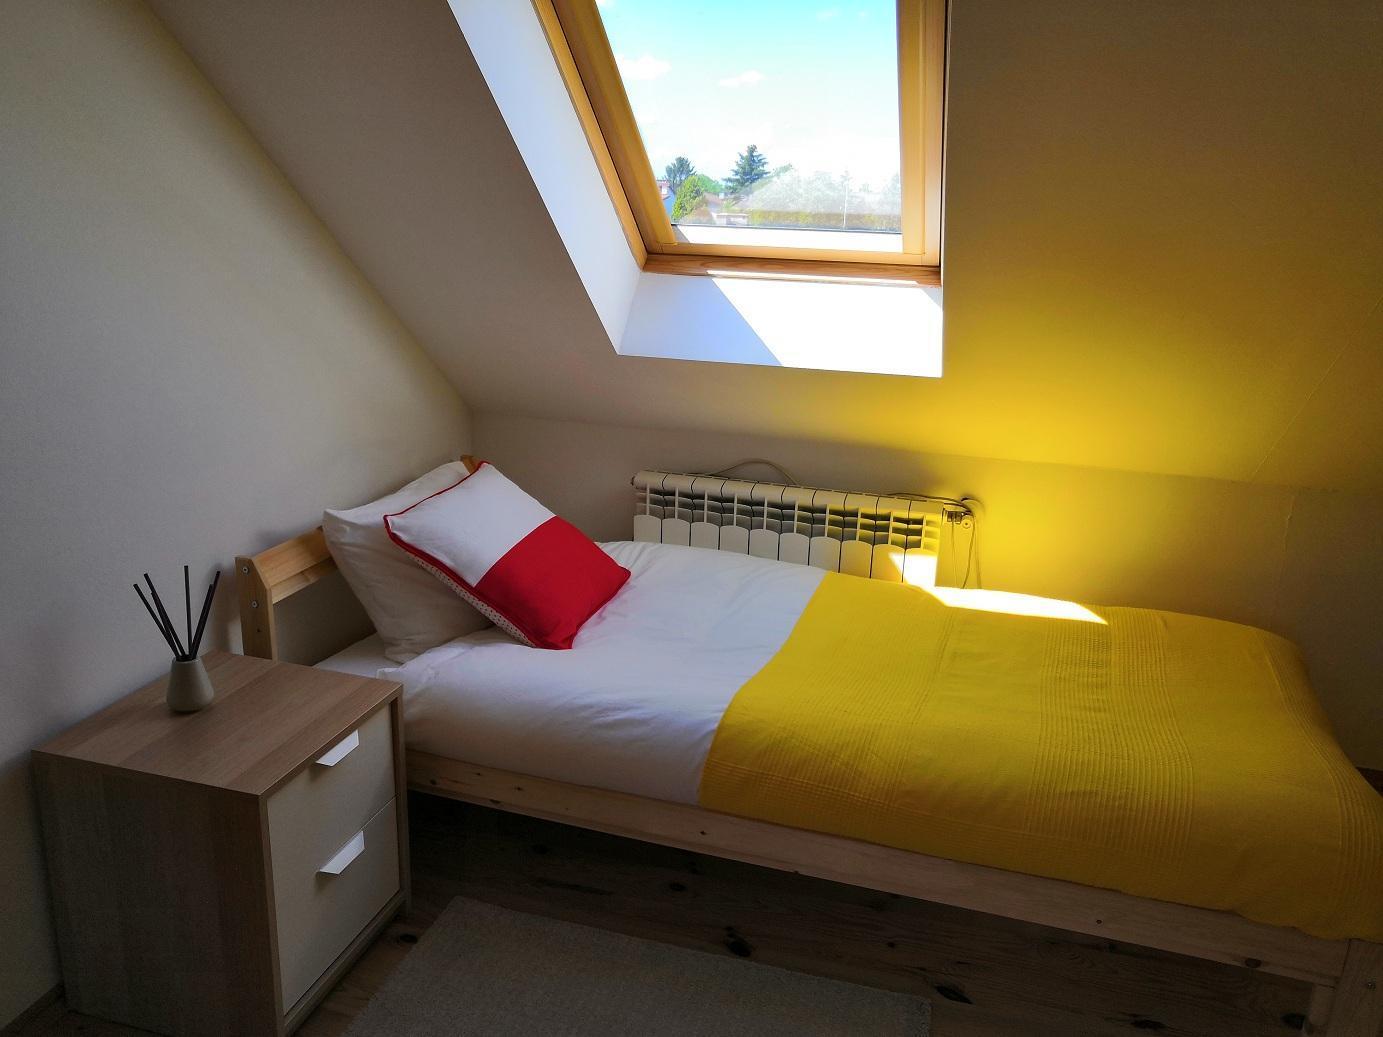 2 Single Beds 2 People Room 209